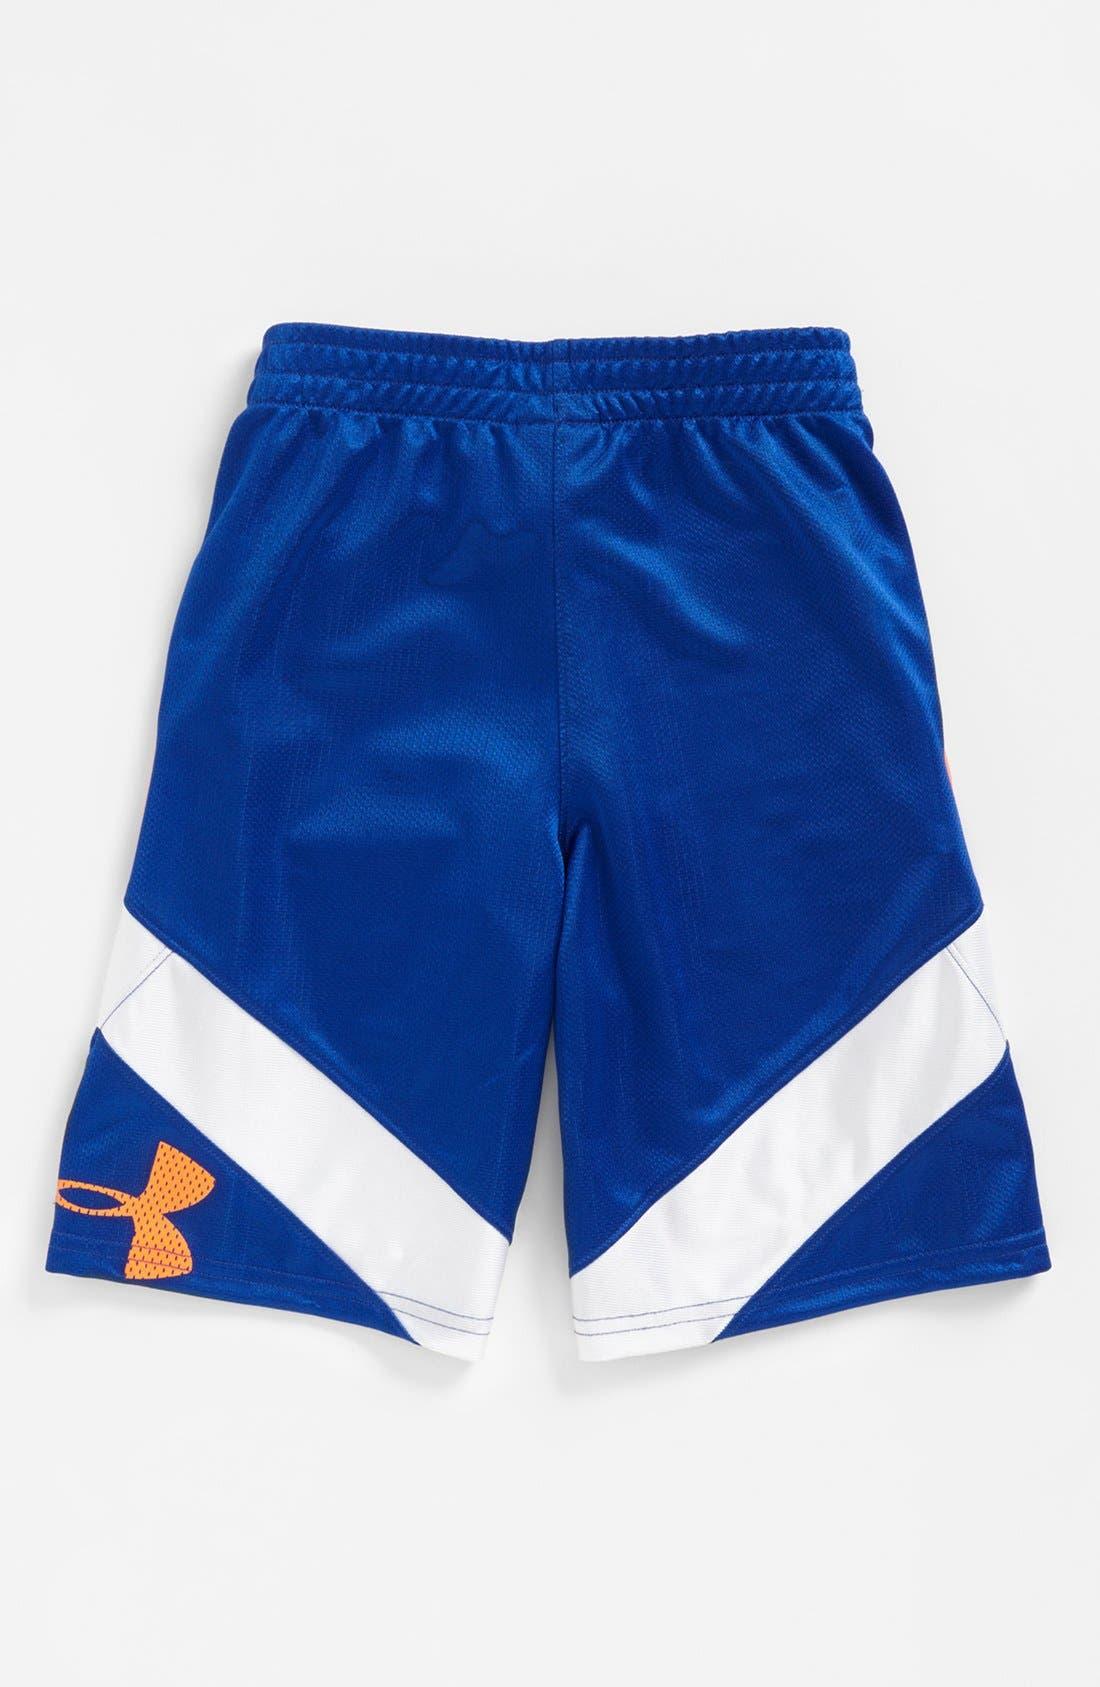 Alternate Image 2  - Under Armour 'Jhawk' Shorts (Little Boys)